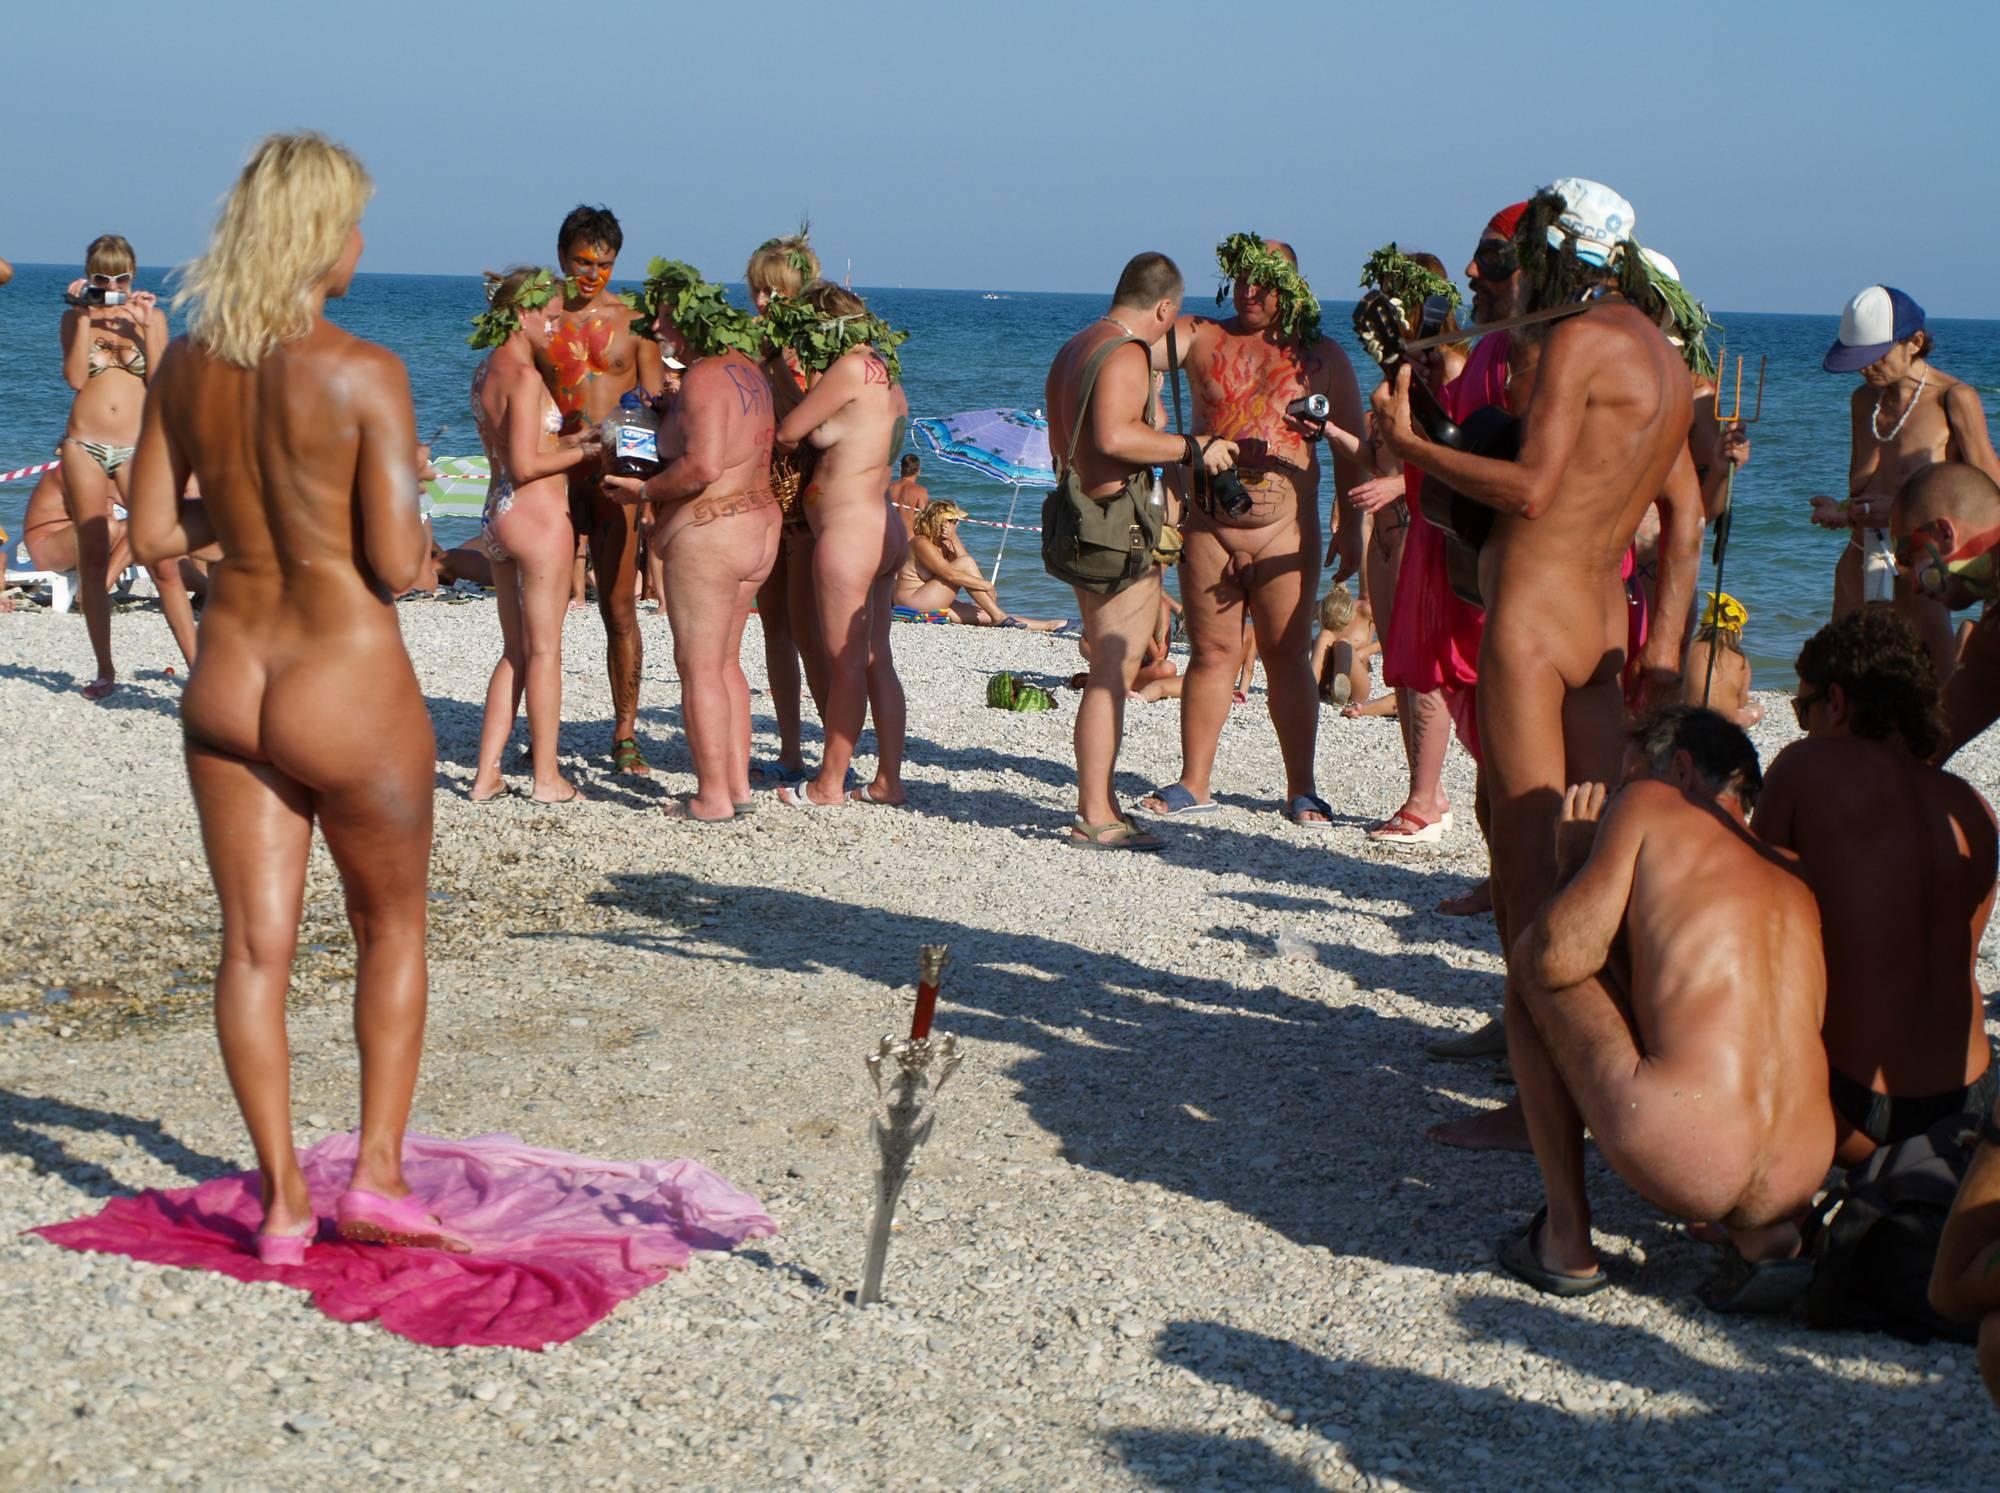 Pure Nudism Images Red Cape Naturist Escorts - 1